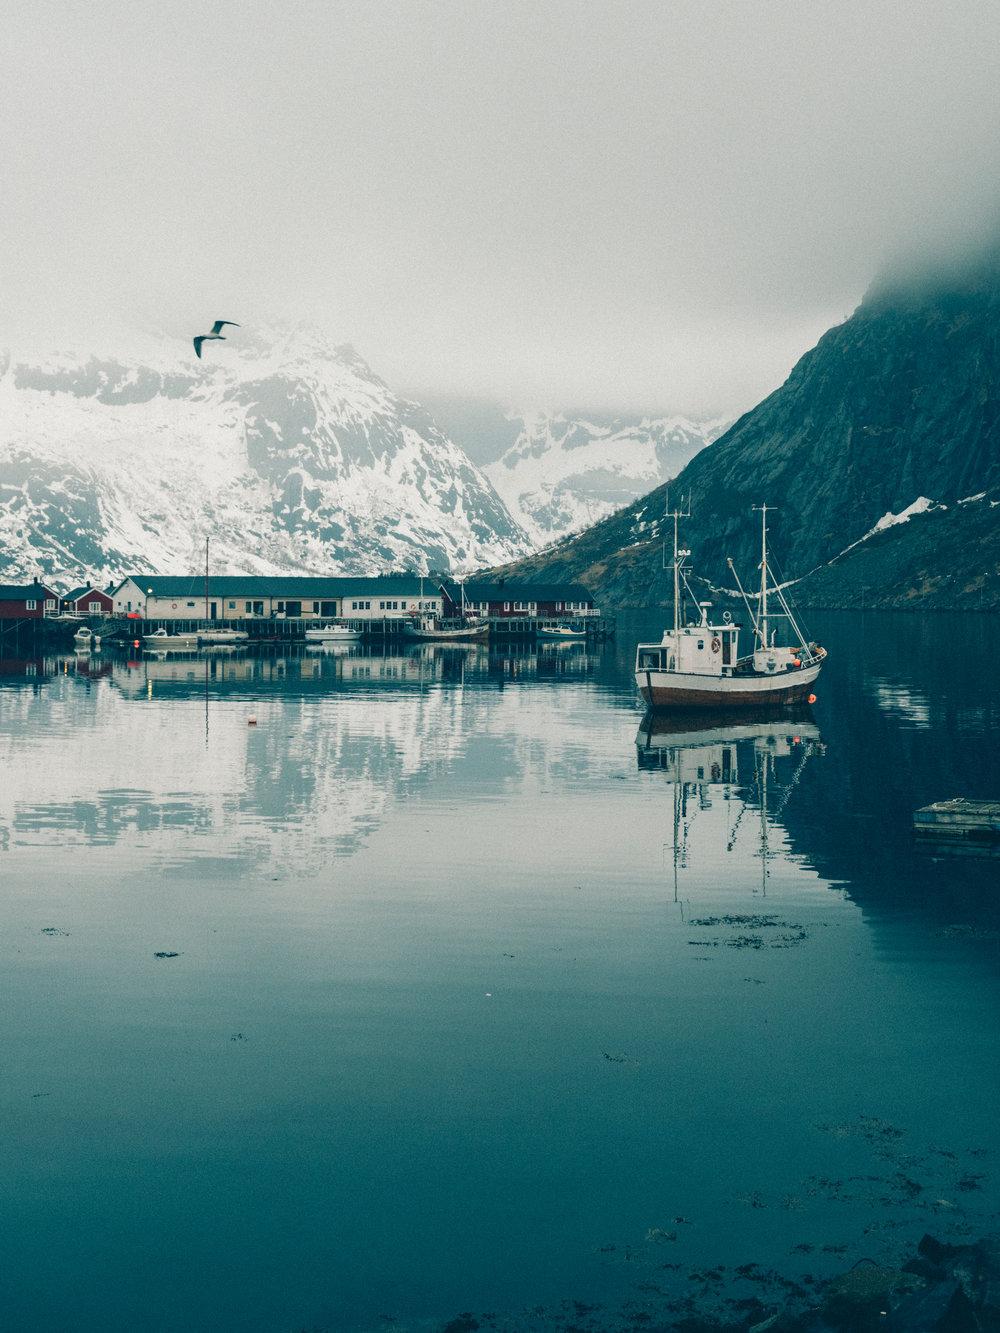 boat-hamnoy-fishing-lofoten-norway